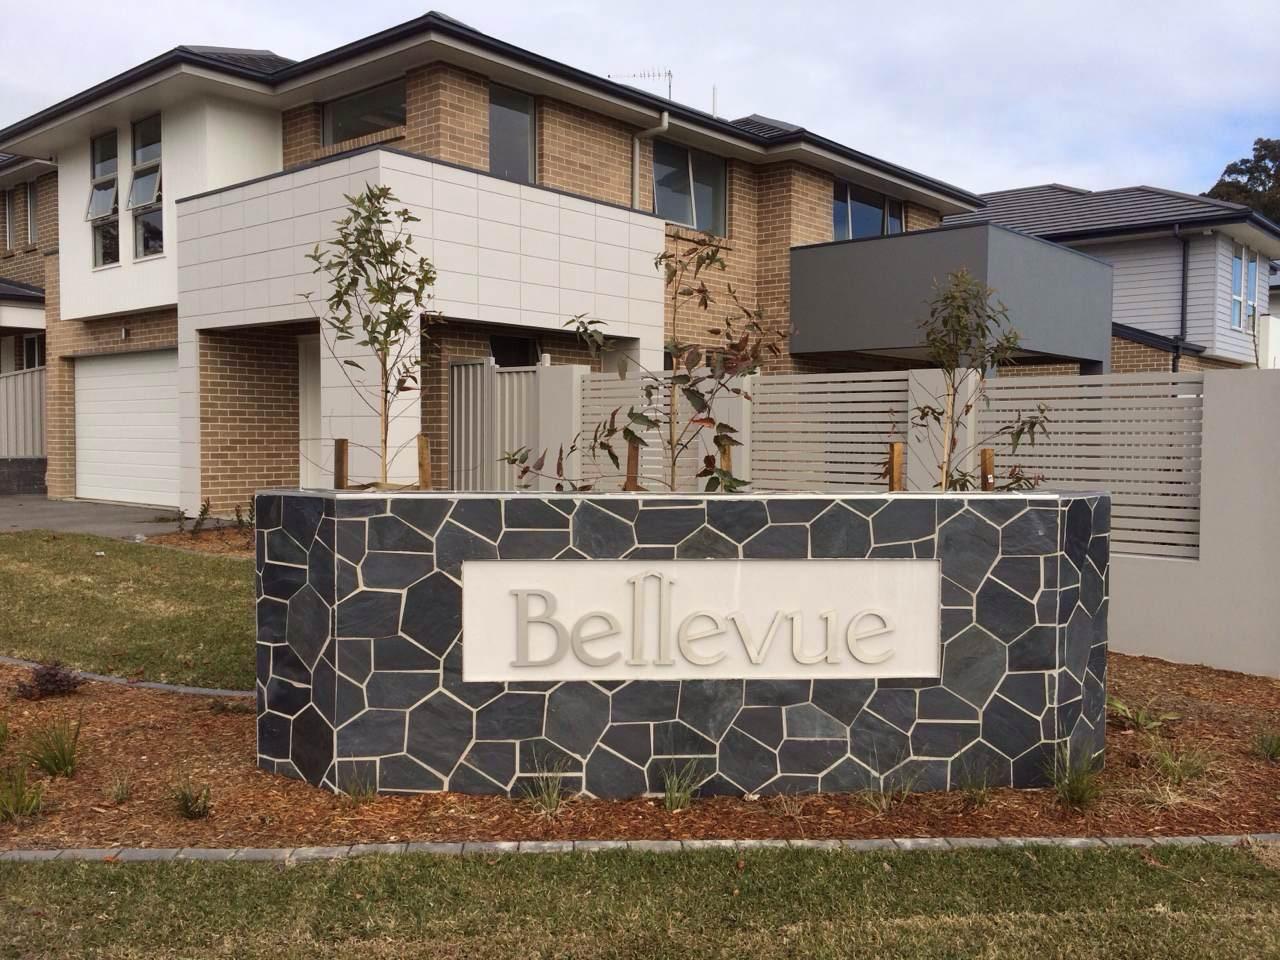 Kellyville Bellevue